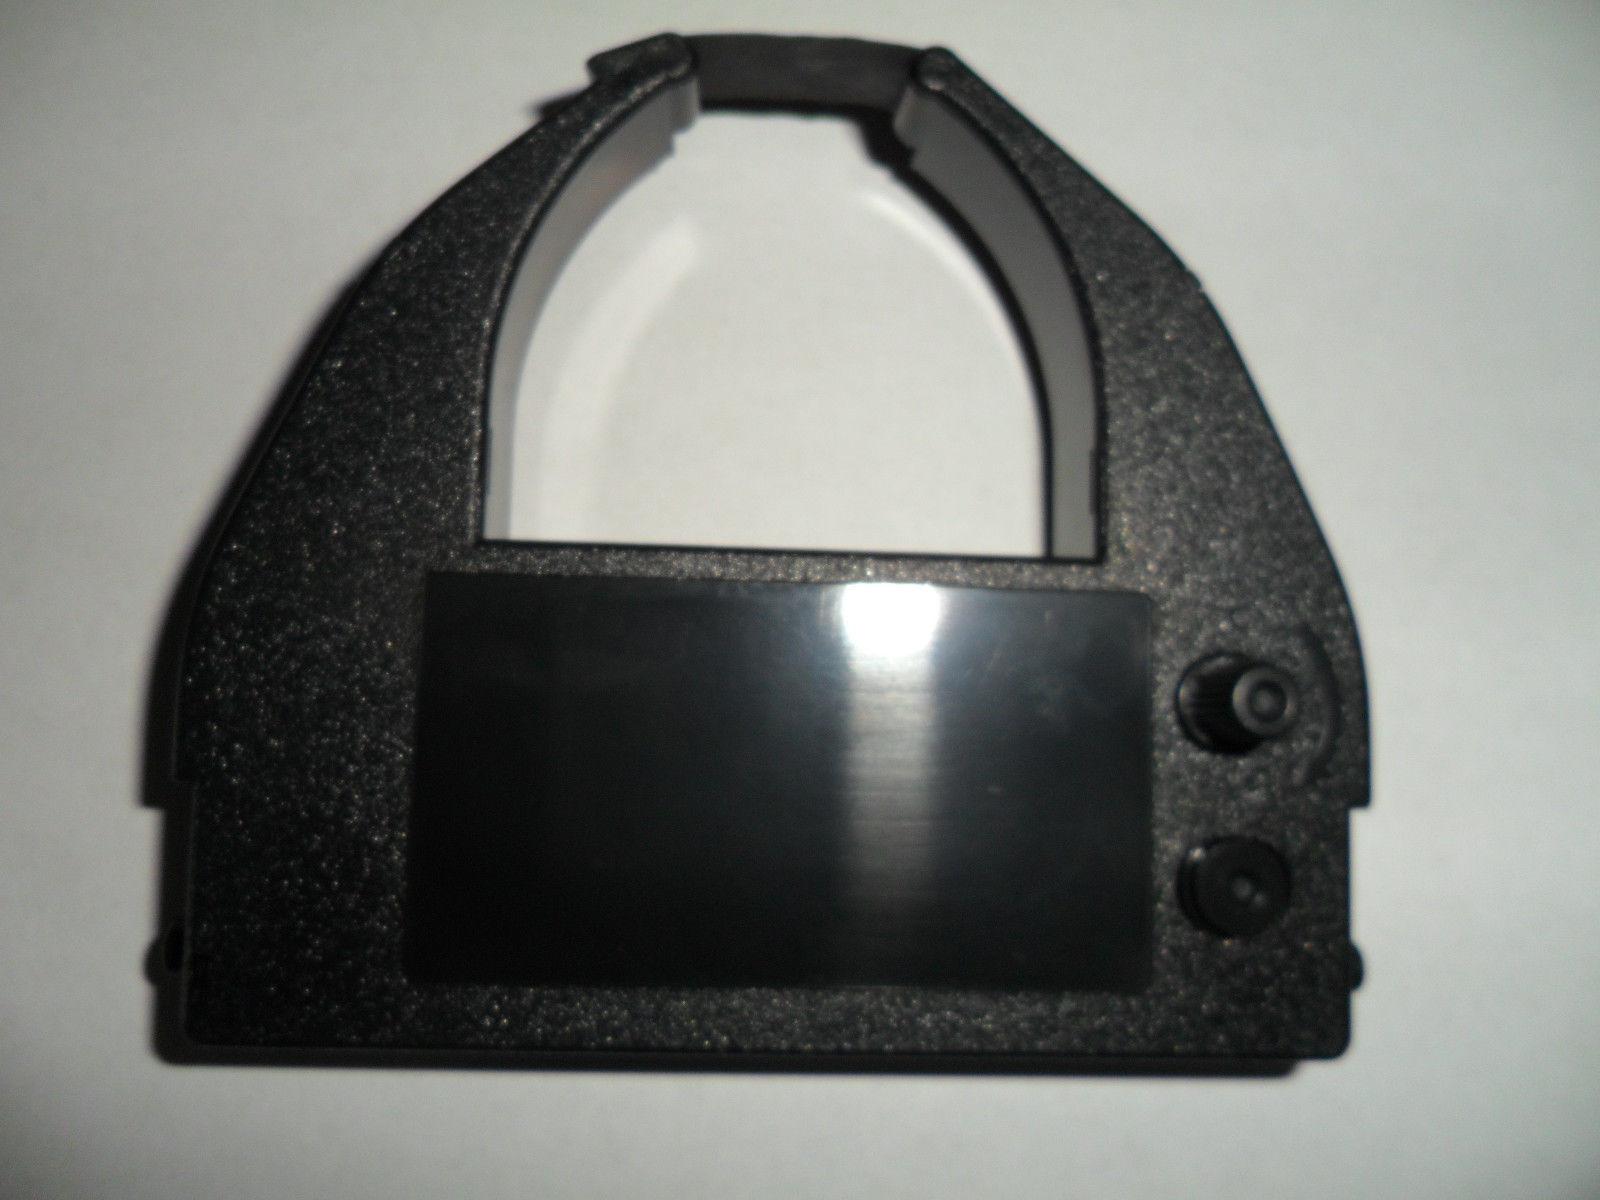 Amano MJR8000N/MJR8150 Time Clock Ribbon Black (2 Pack) Replaces C-872404